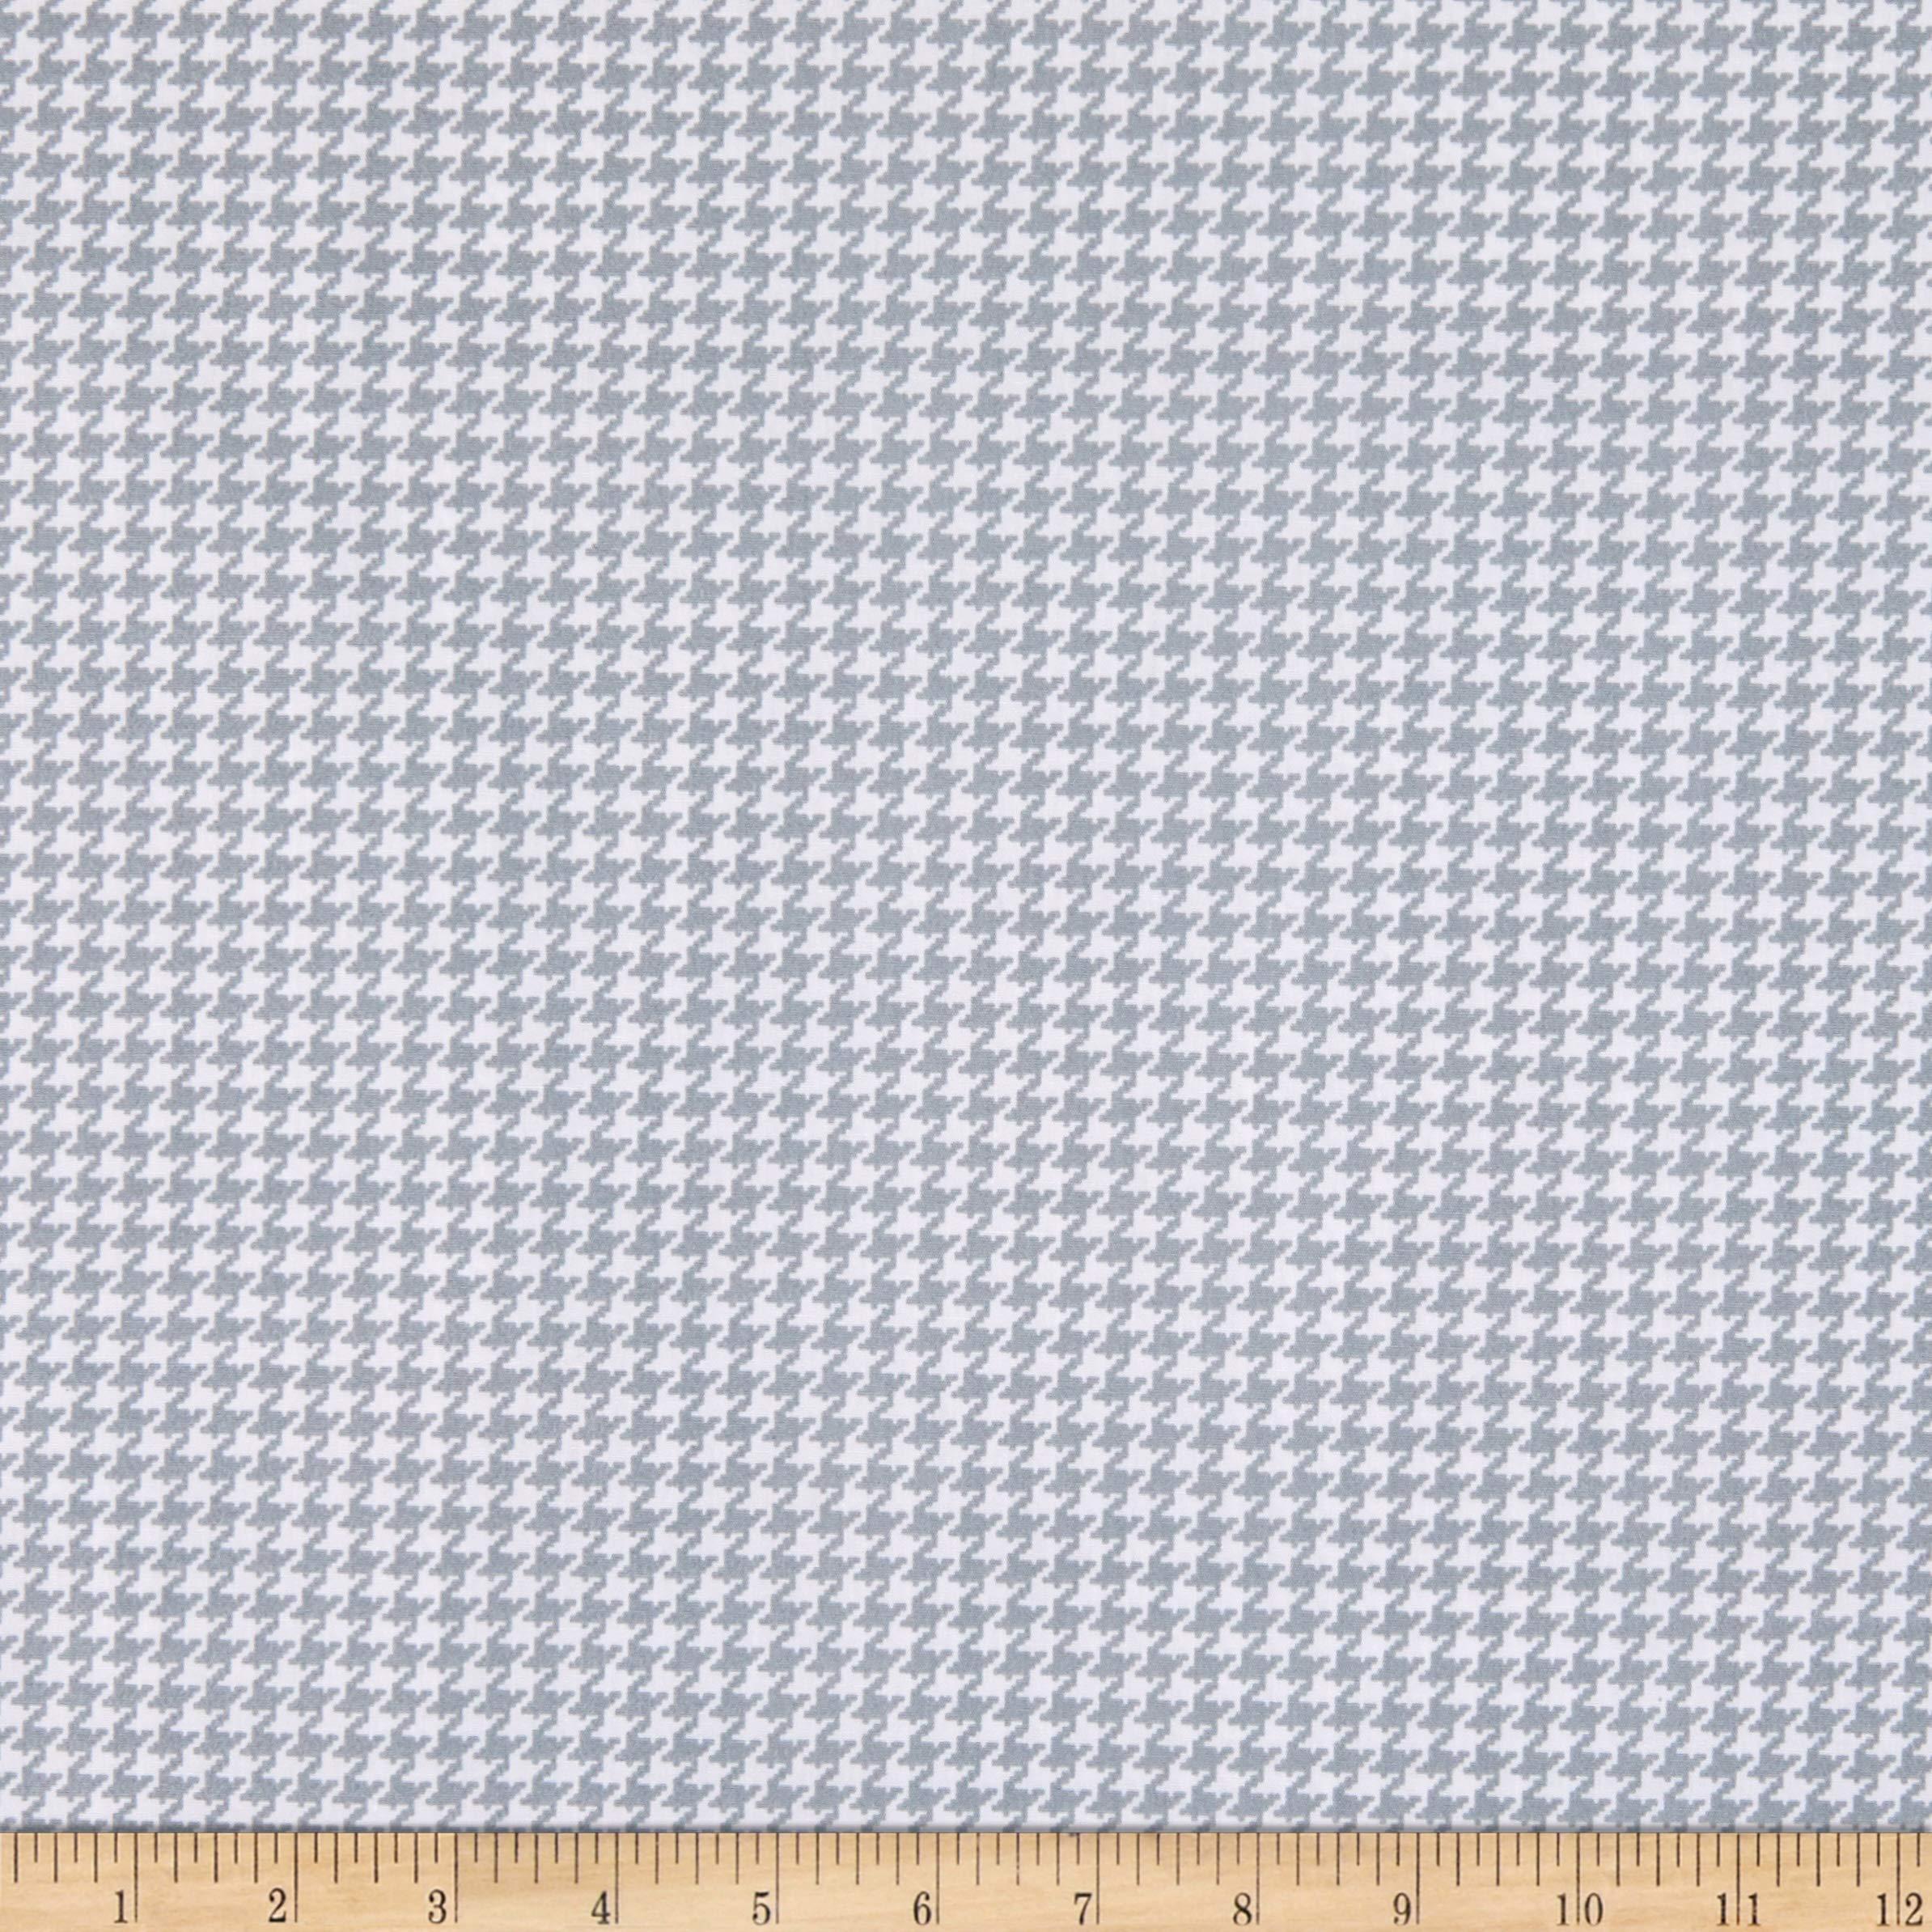 Benartex Kanvas Better Basics Deluxe Cotton Tiny Houndstooth, White/Grey Yard